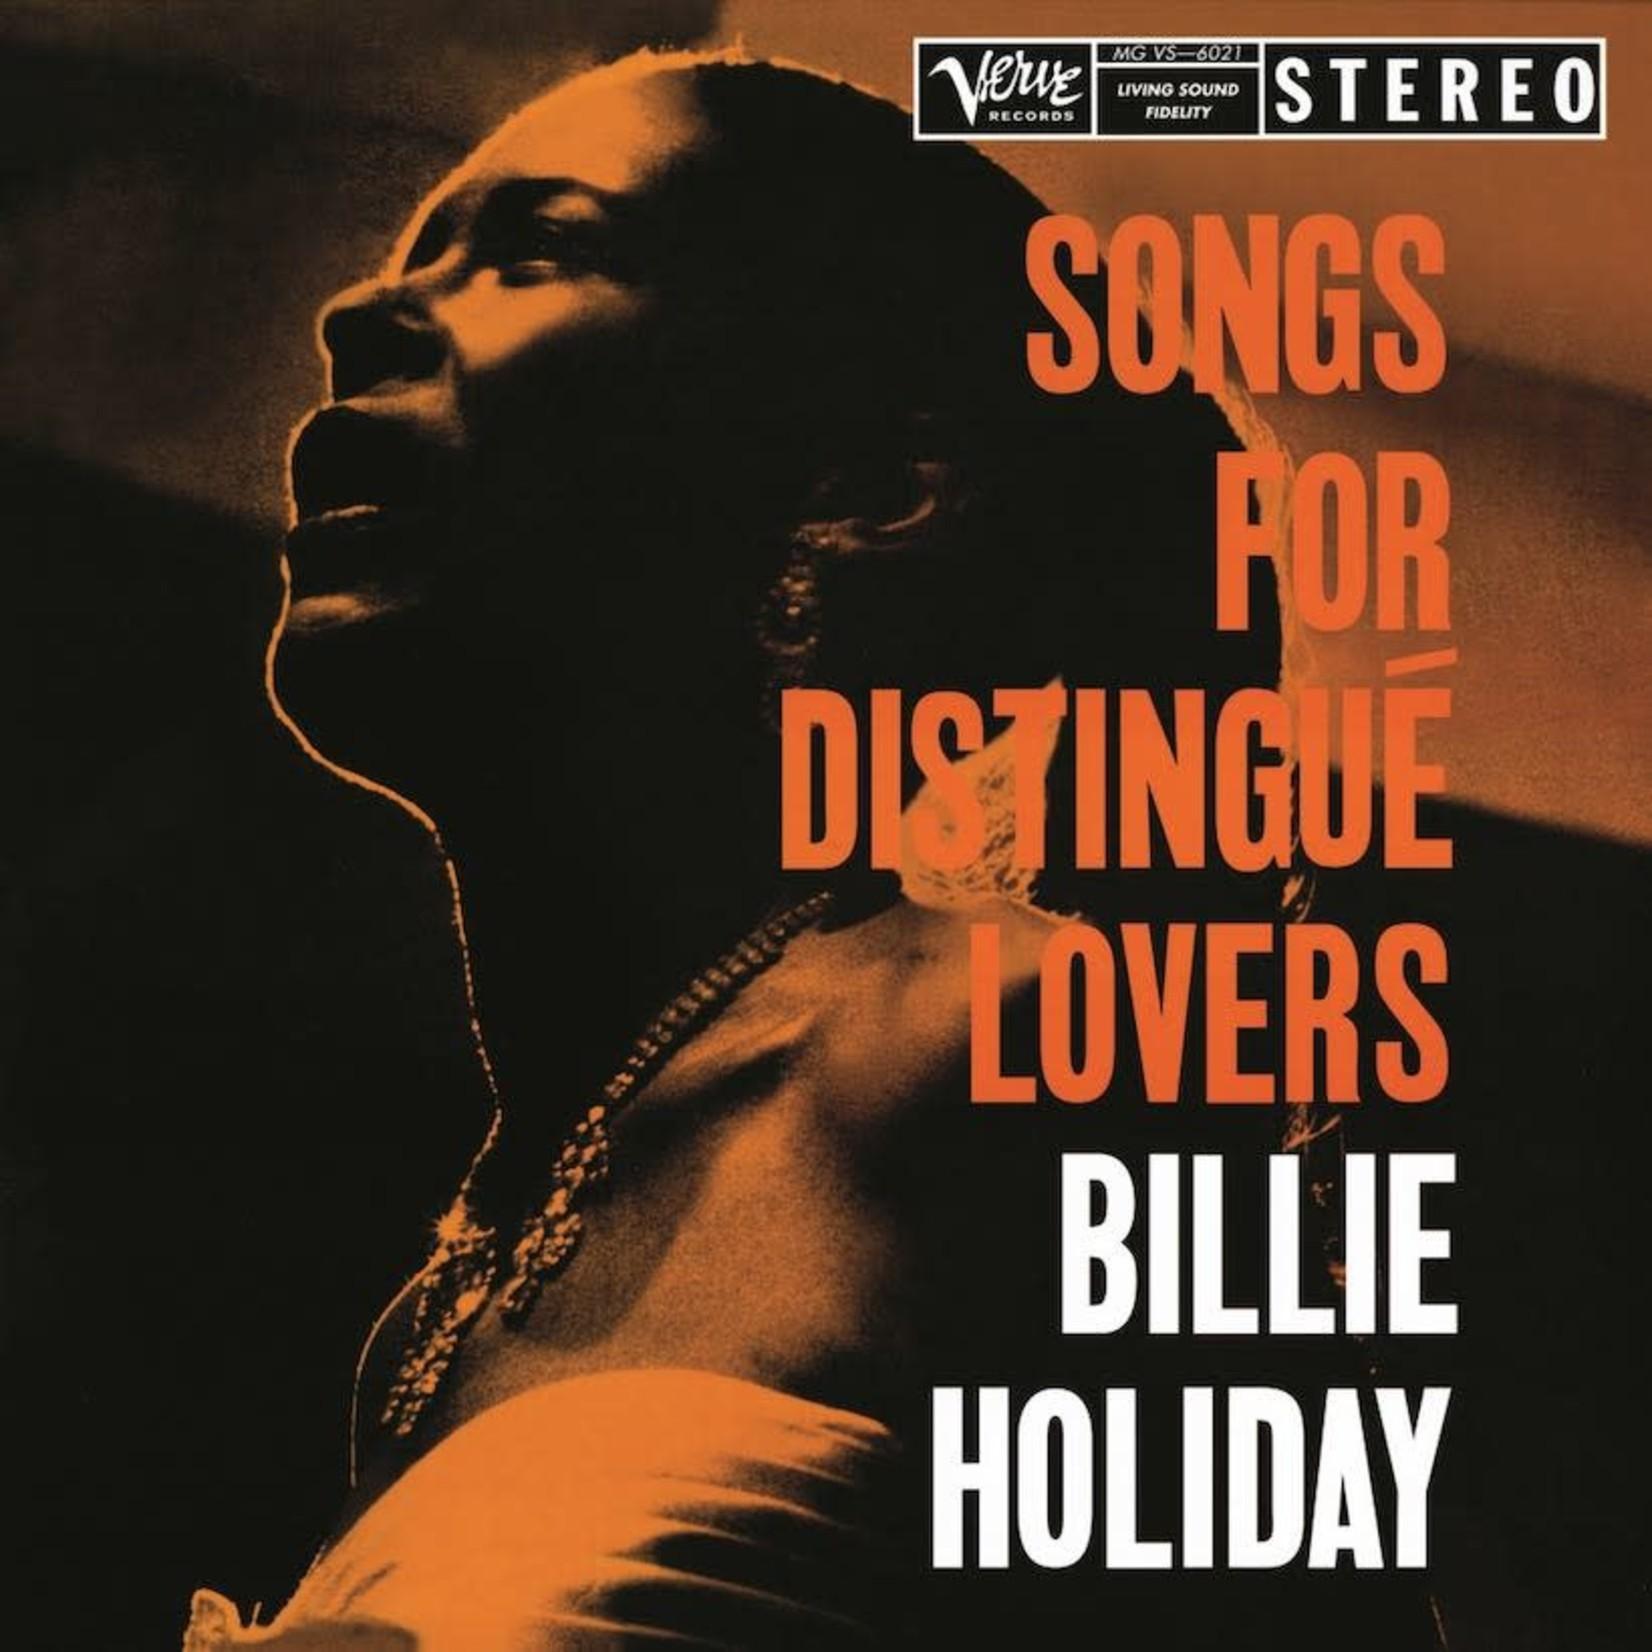 [New] Holiday, Billie: Songs for Distingue Lovers (Vital Vinyl Series)